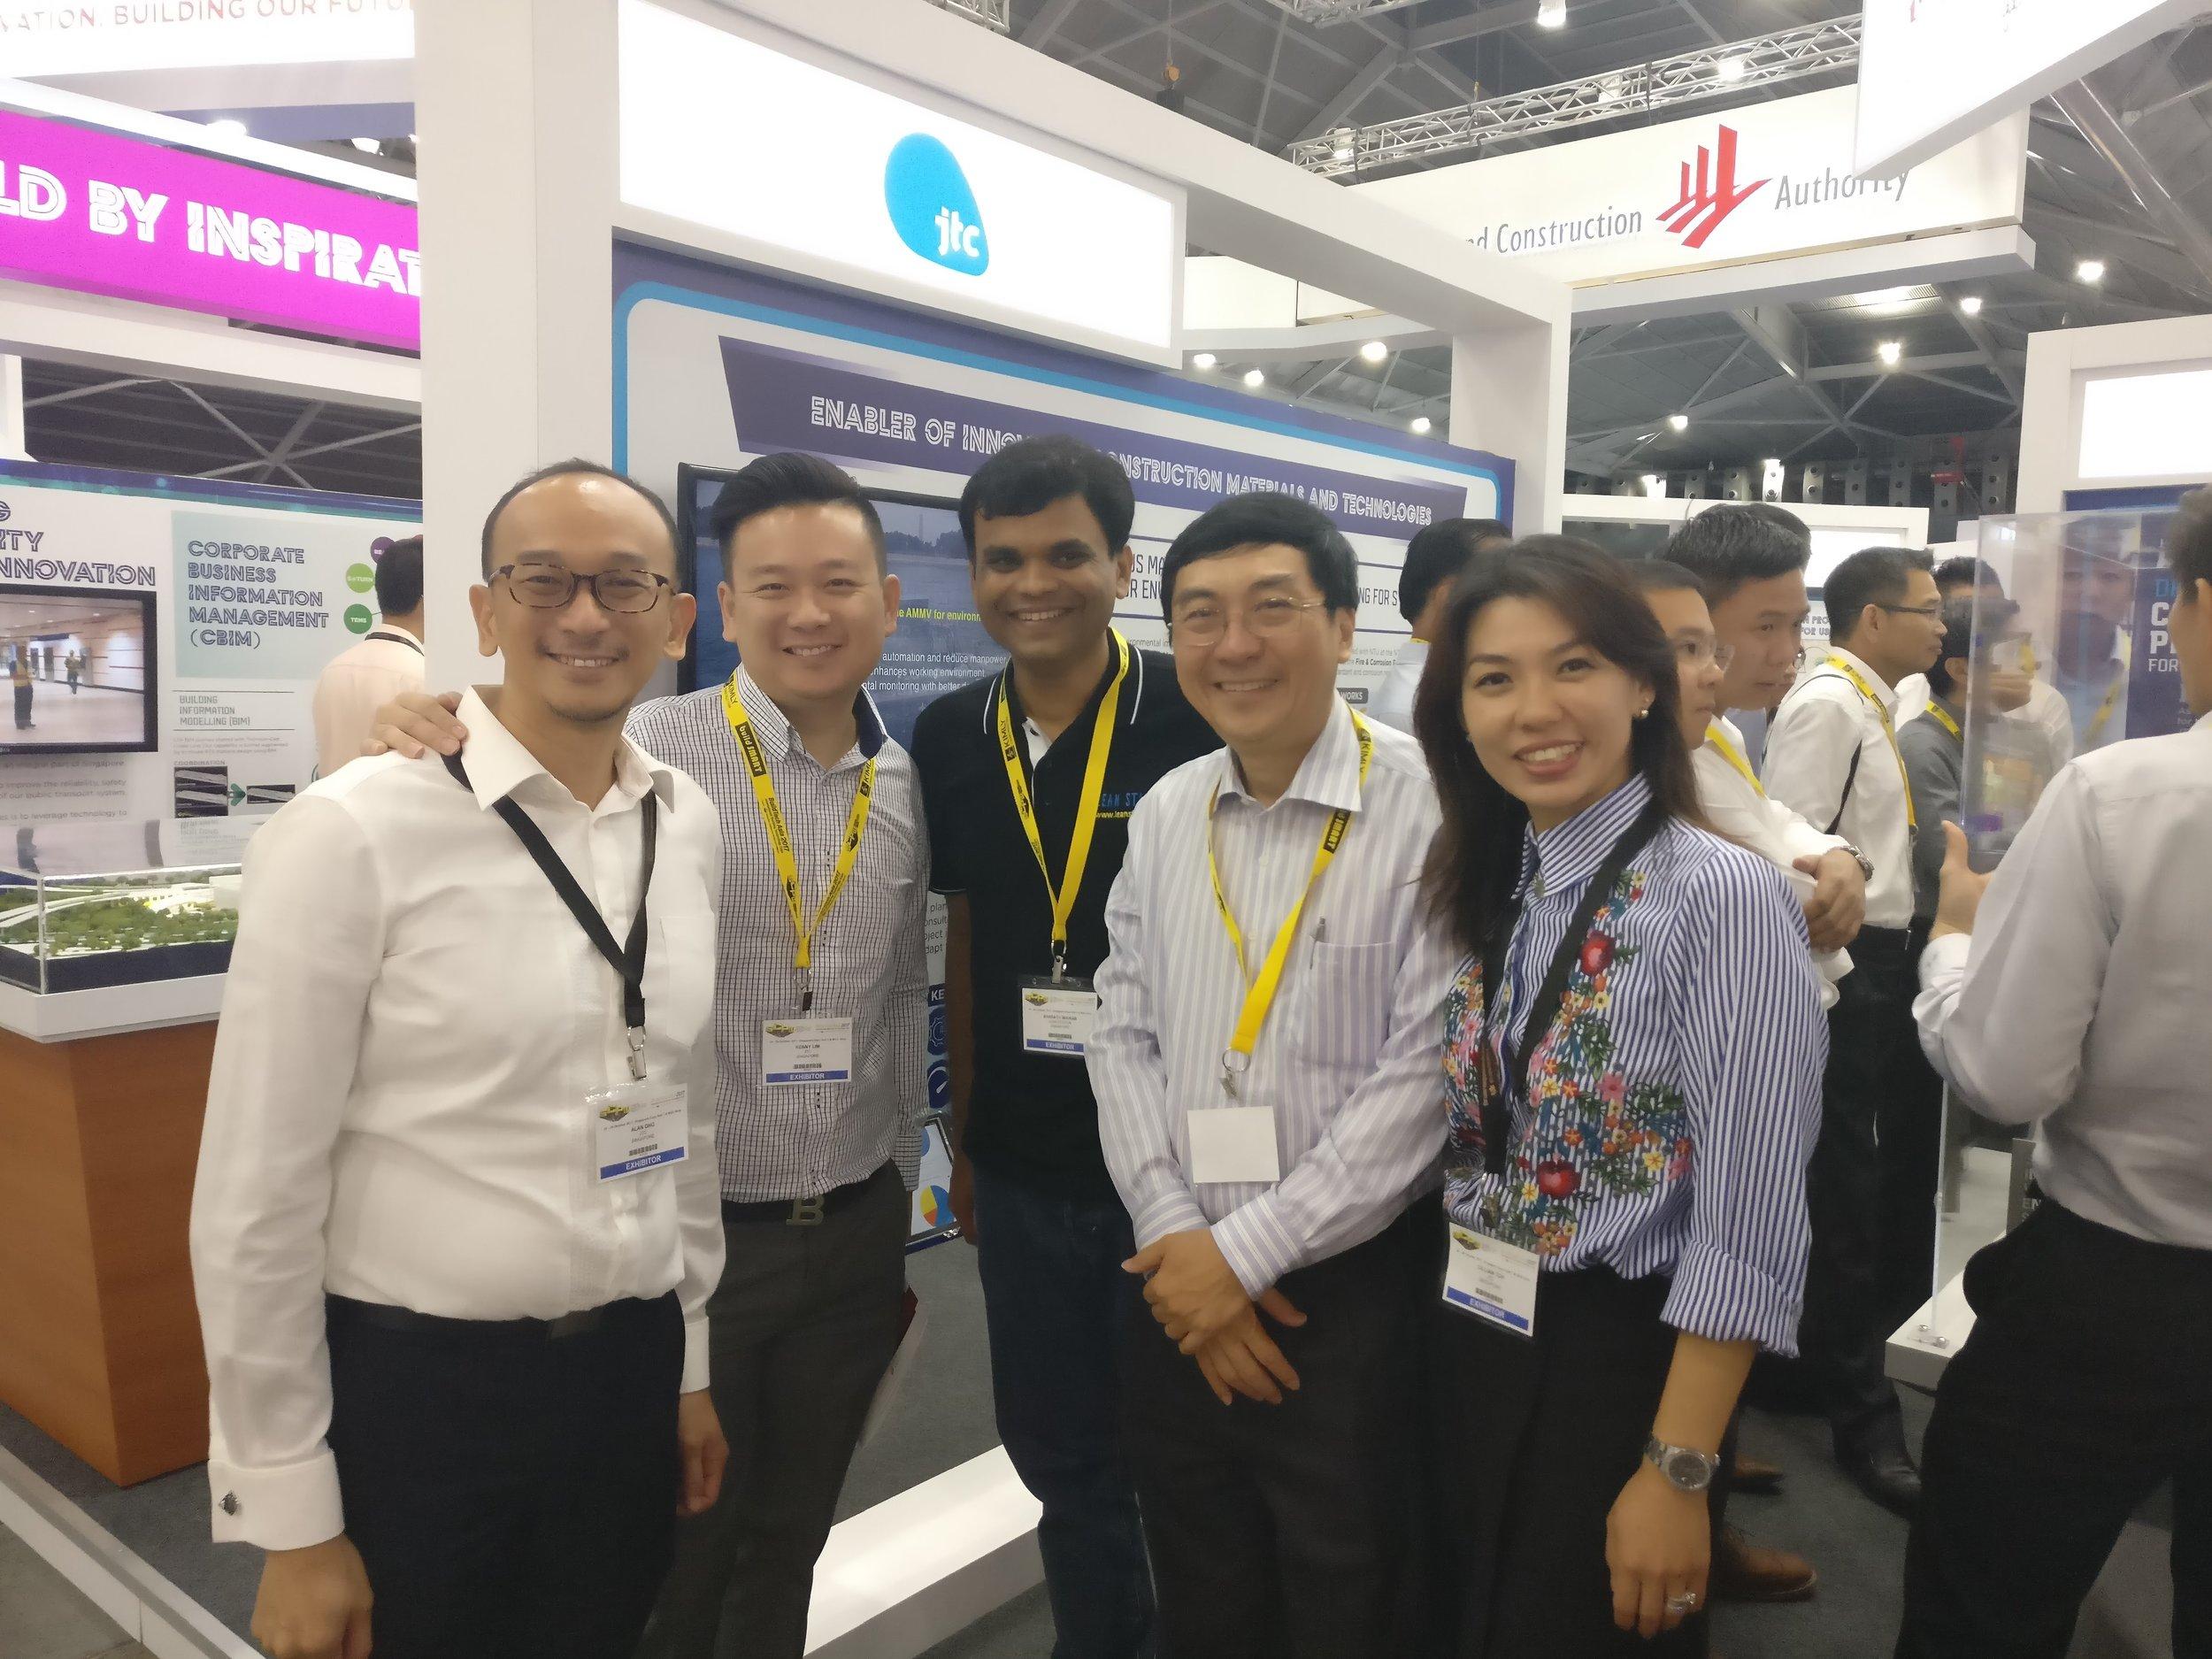 Mr. Alan Ong, Mr. Kenny Lim, Mr. Sharath Waikar, Prof. David Chua, Ms. Cillian Toh